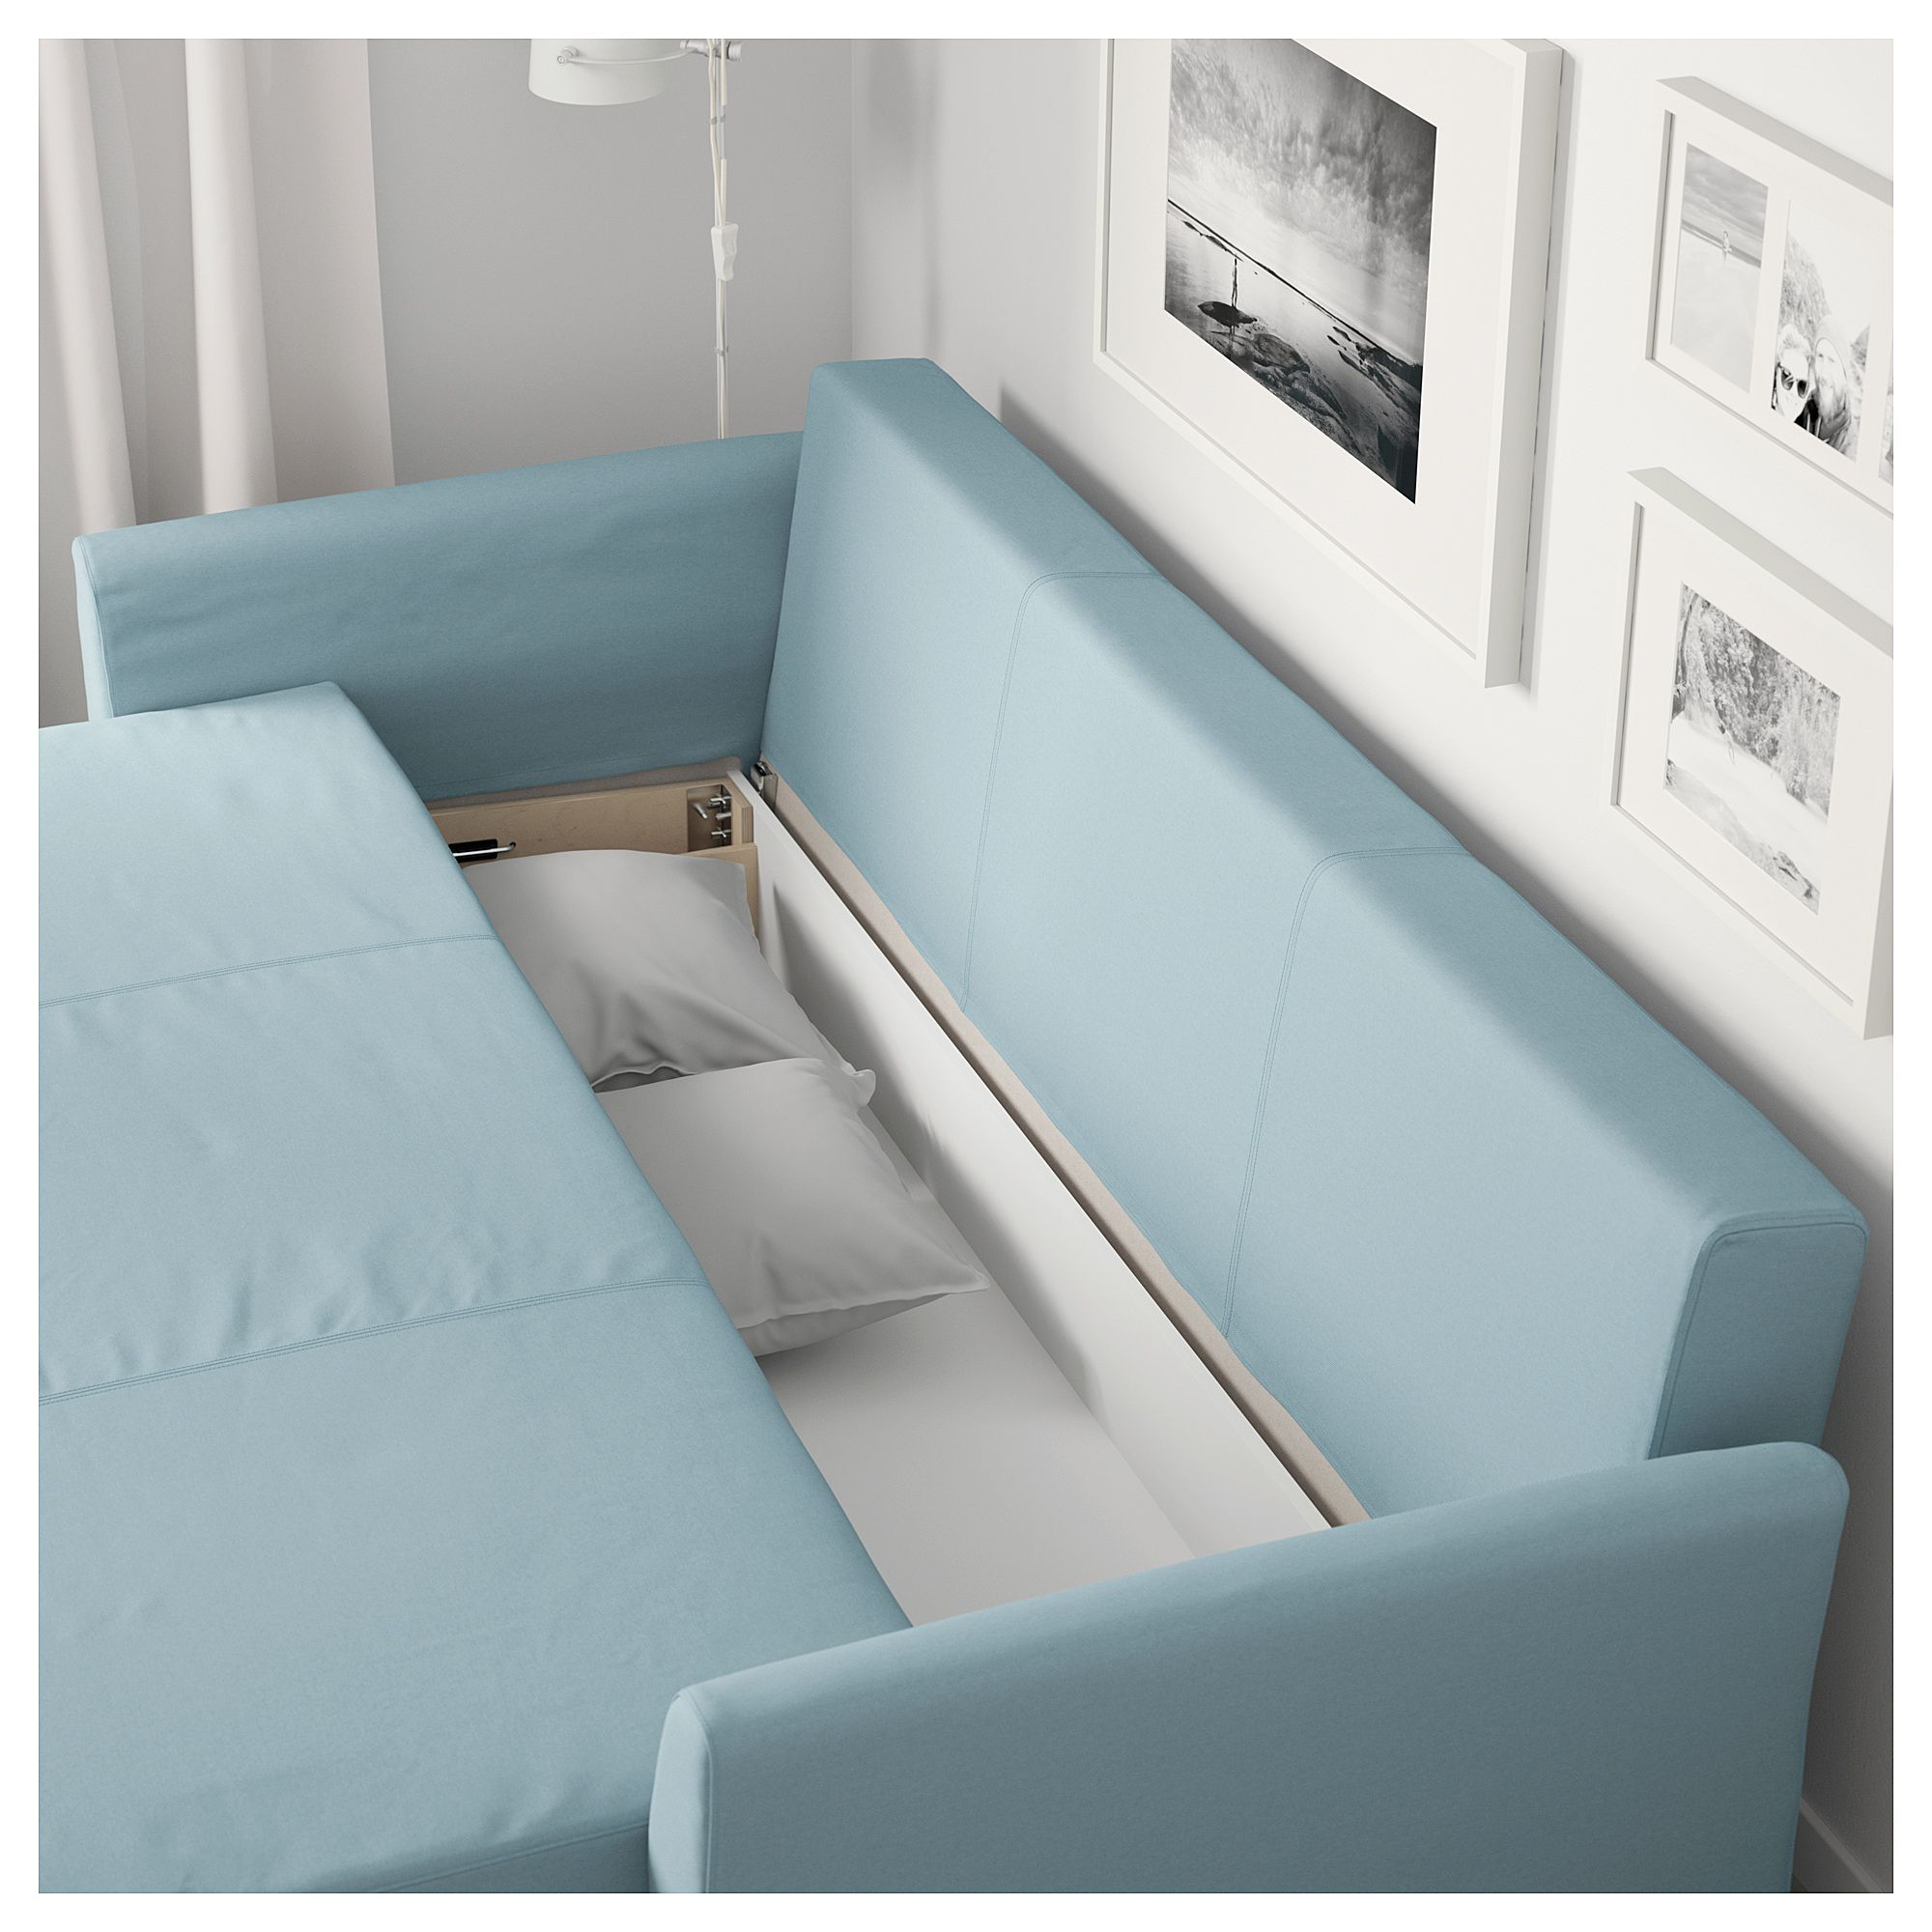 Holmsund Sofa Bed Orrsta Light Blue Ikea Sofa Bed Ikea Bed Sofa Bed Frame